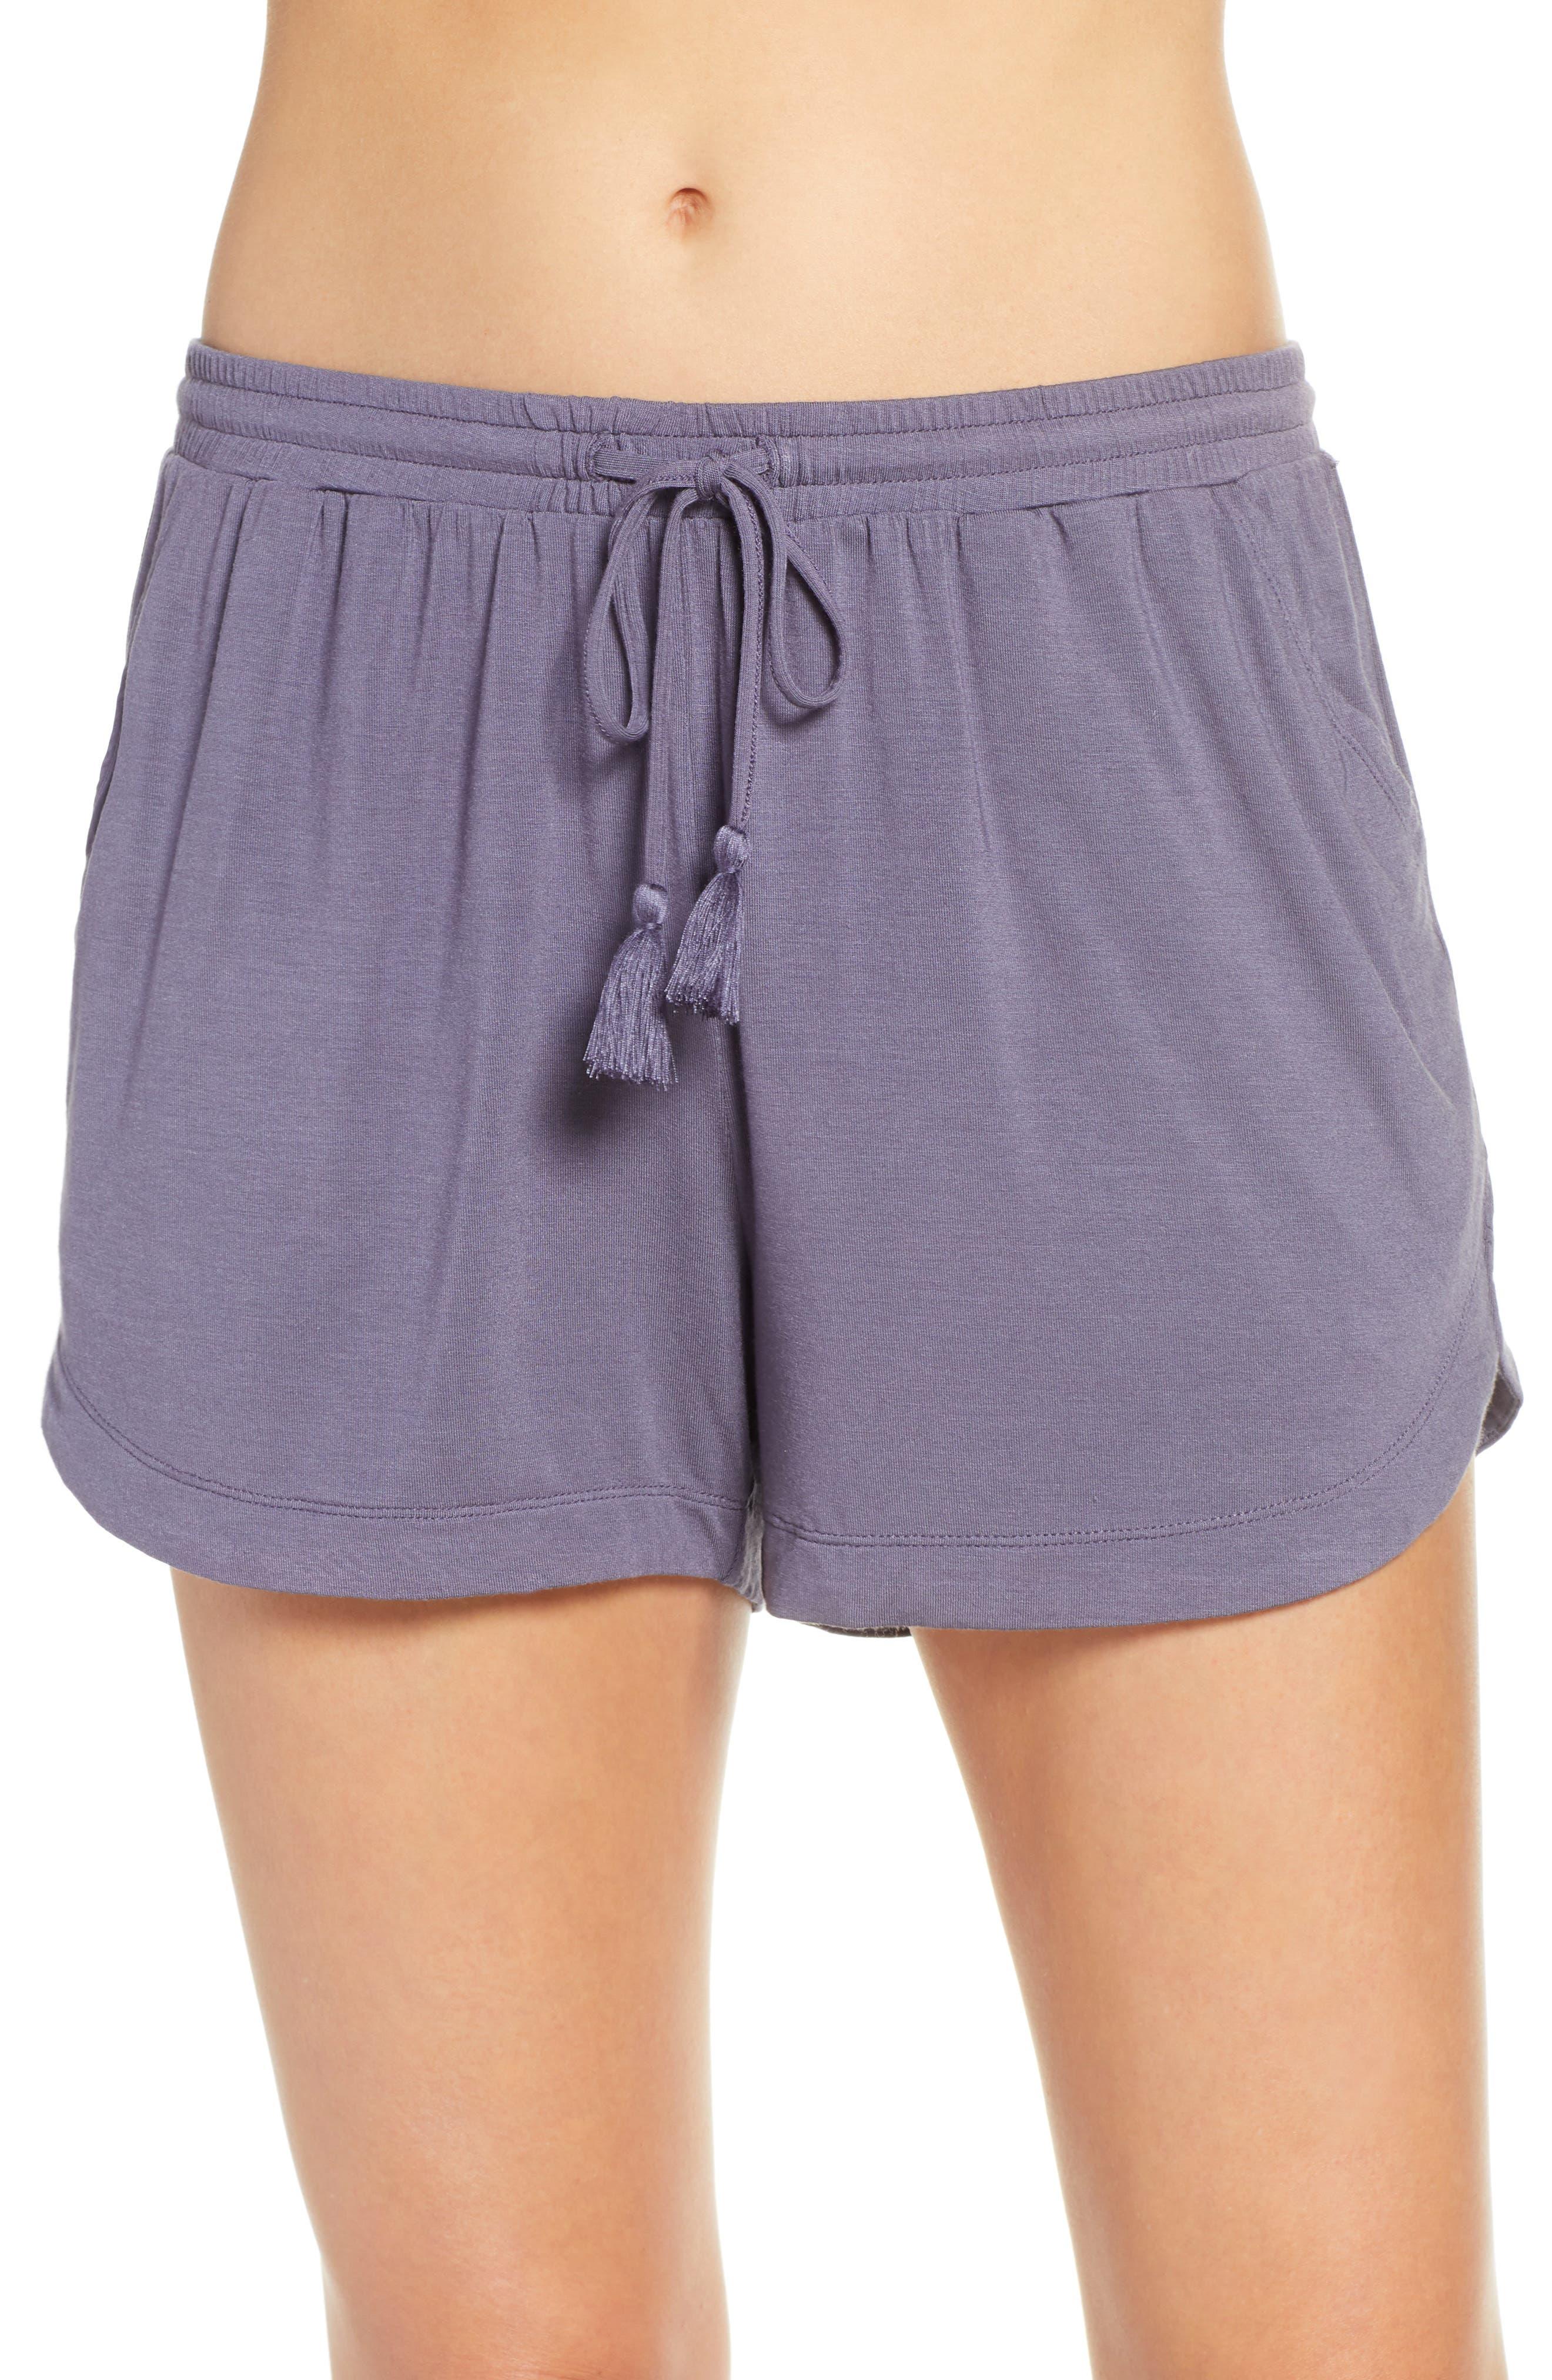 Nordstrom Lingerie Moonlight Pajama Shorts, Grey